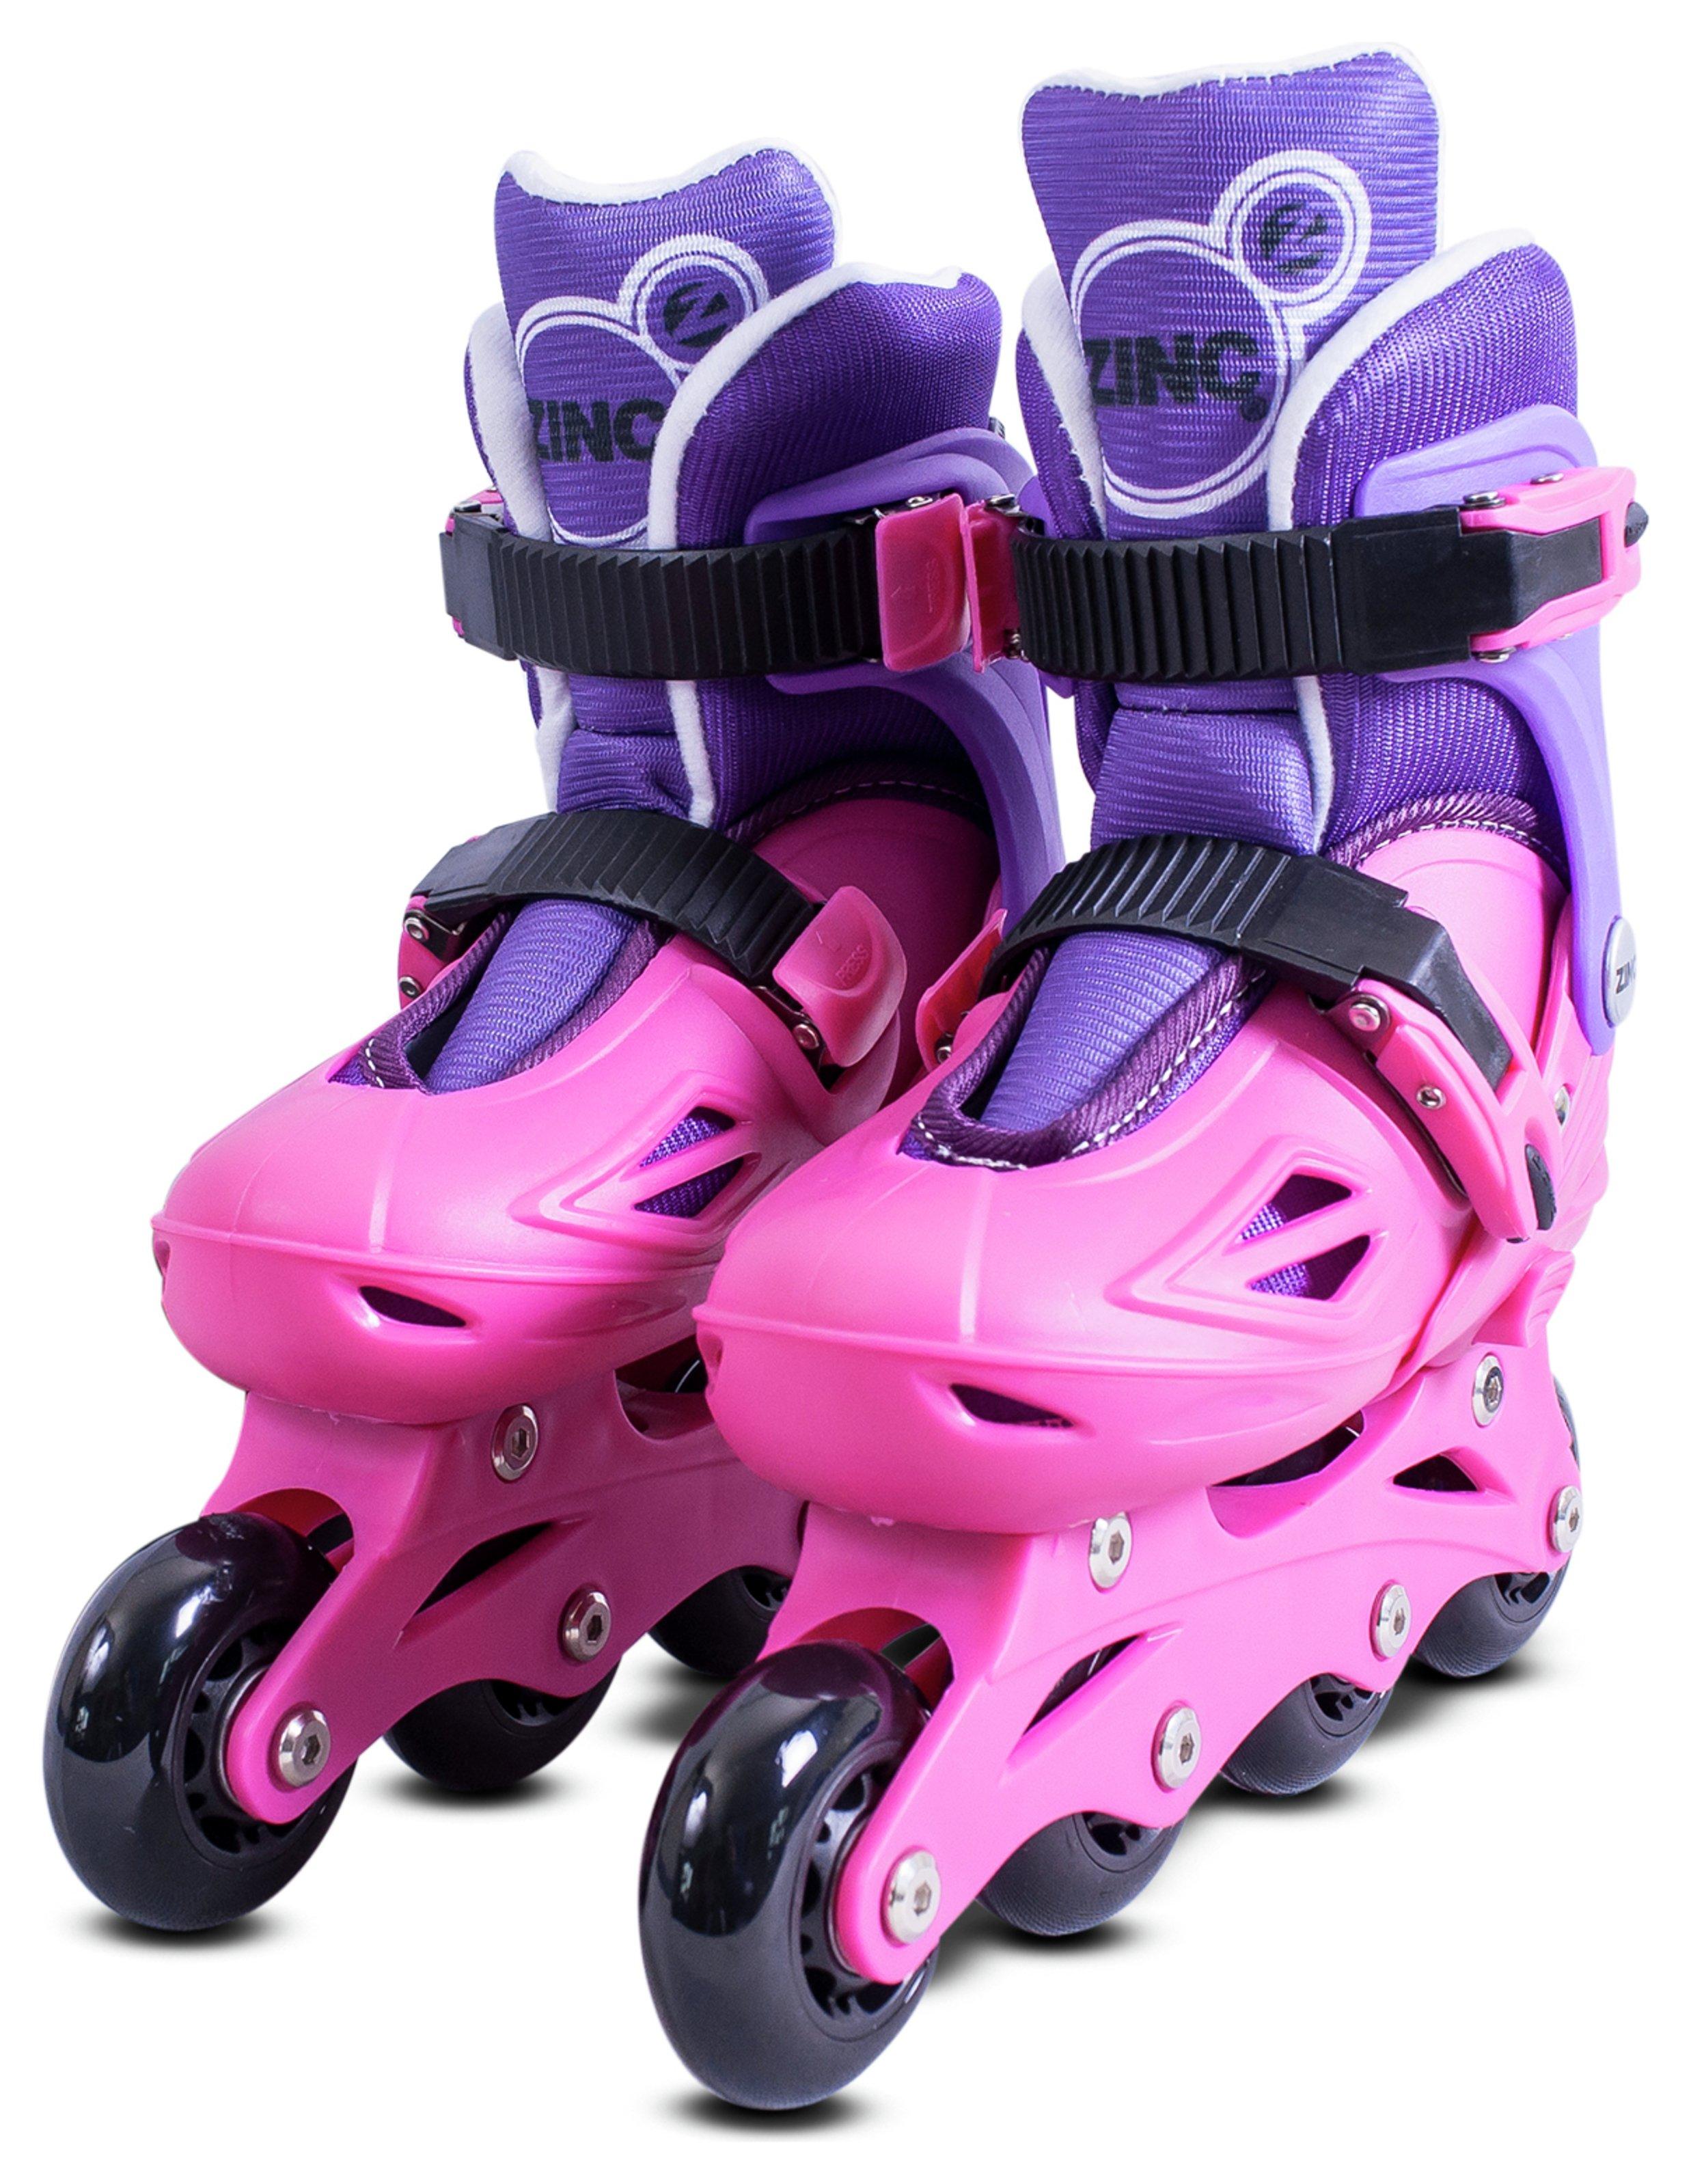 zinc-inline-roller-skates-13-3-pink